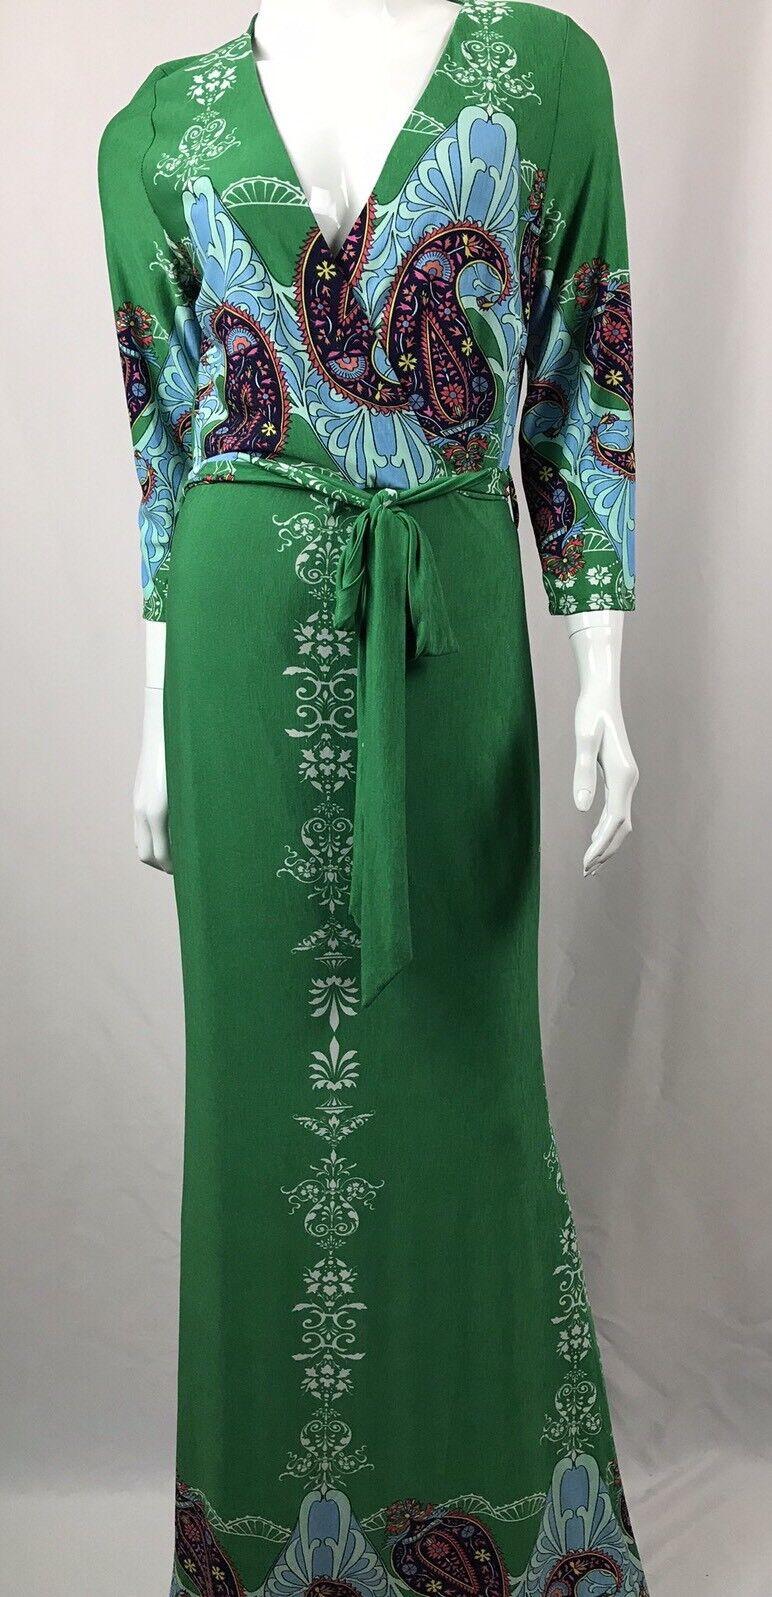 Glamazon Women's Maxi Dress Green Paisley 3 4 Sleeve Tie Waist Sz Medium